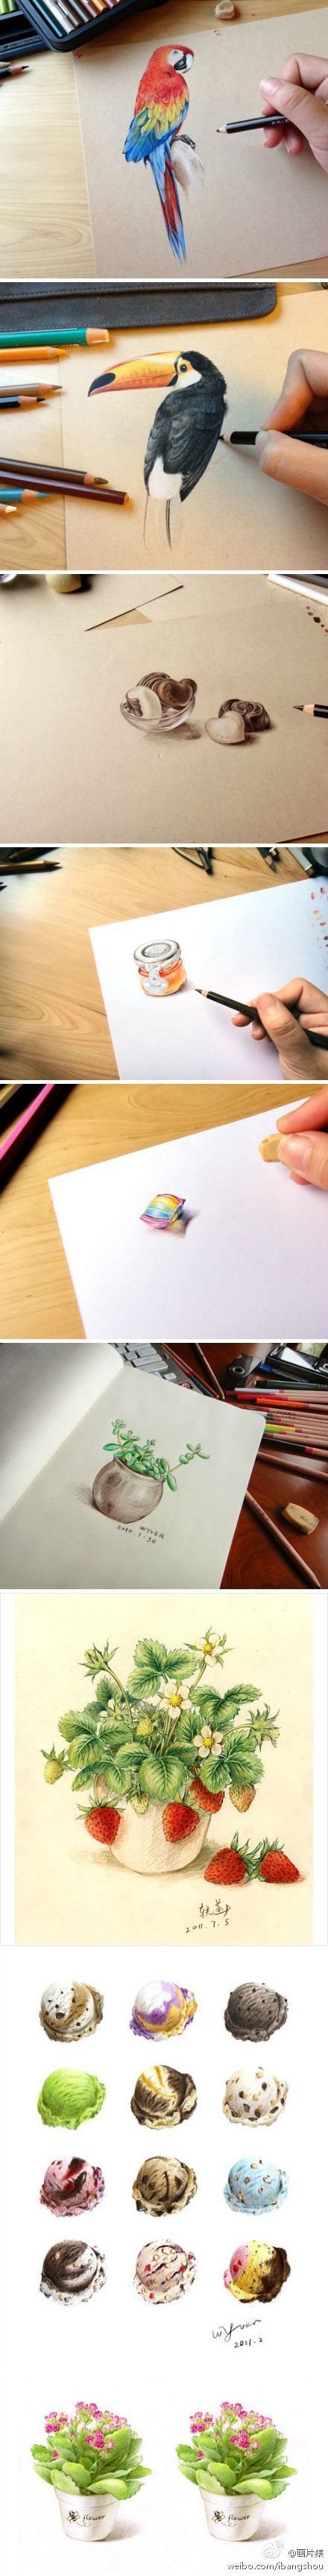 Beautiful colored pencil work